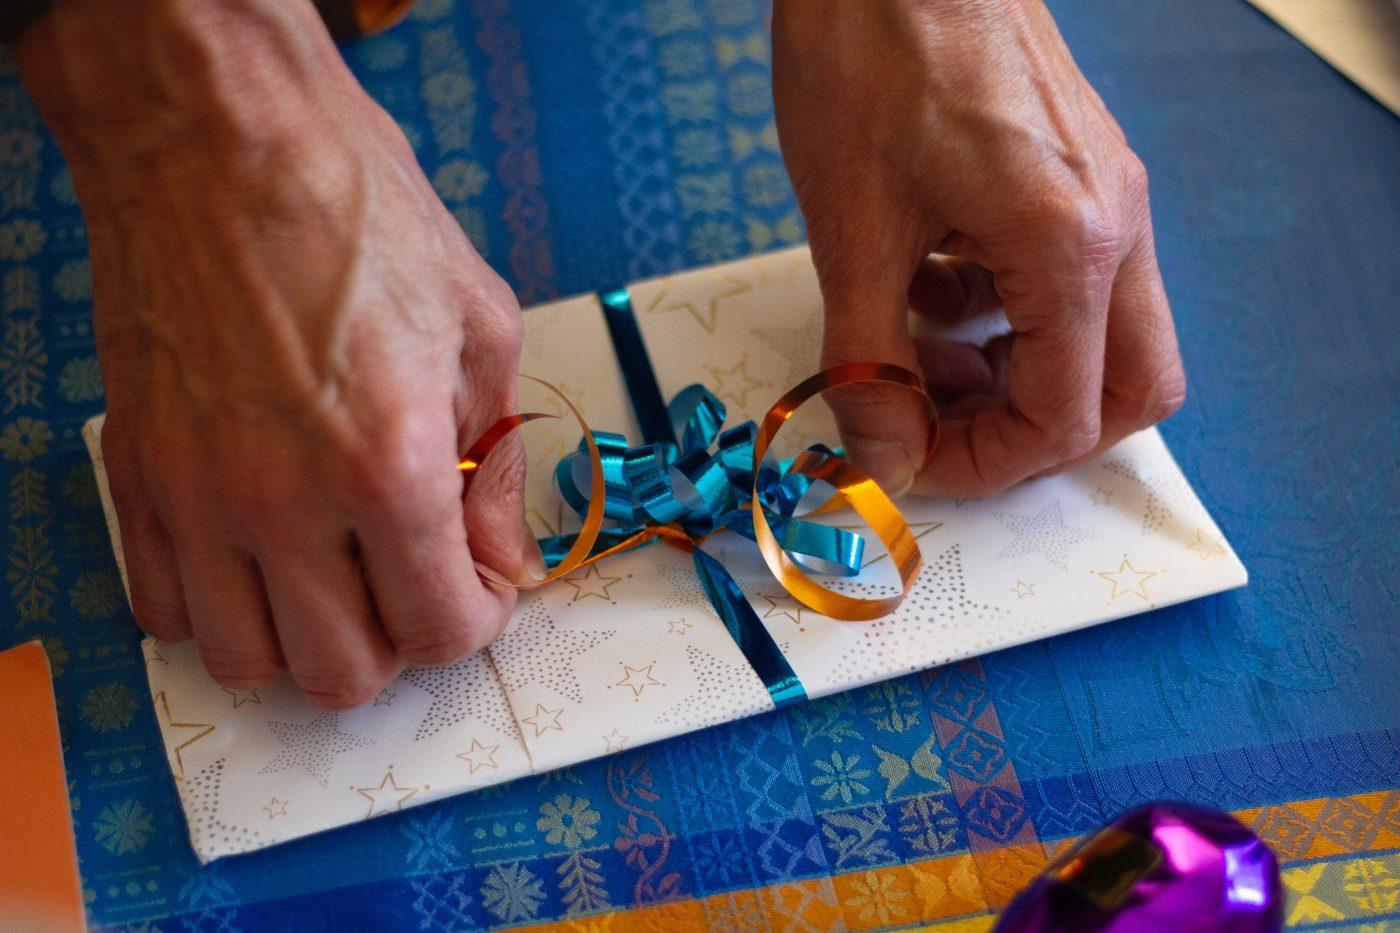 Fringe benefit e gift card: Amilon si unisce a Zucchetti